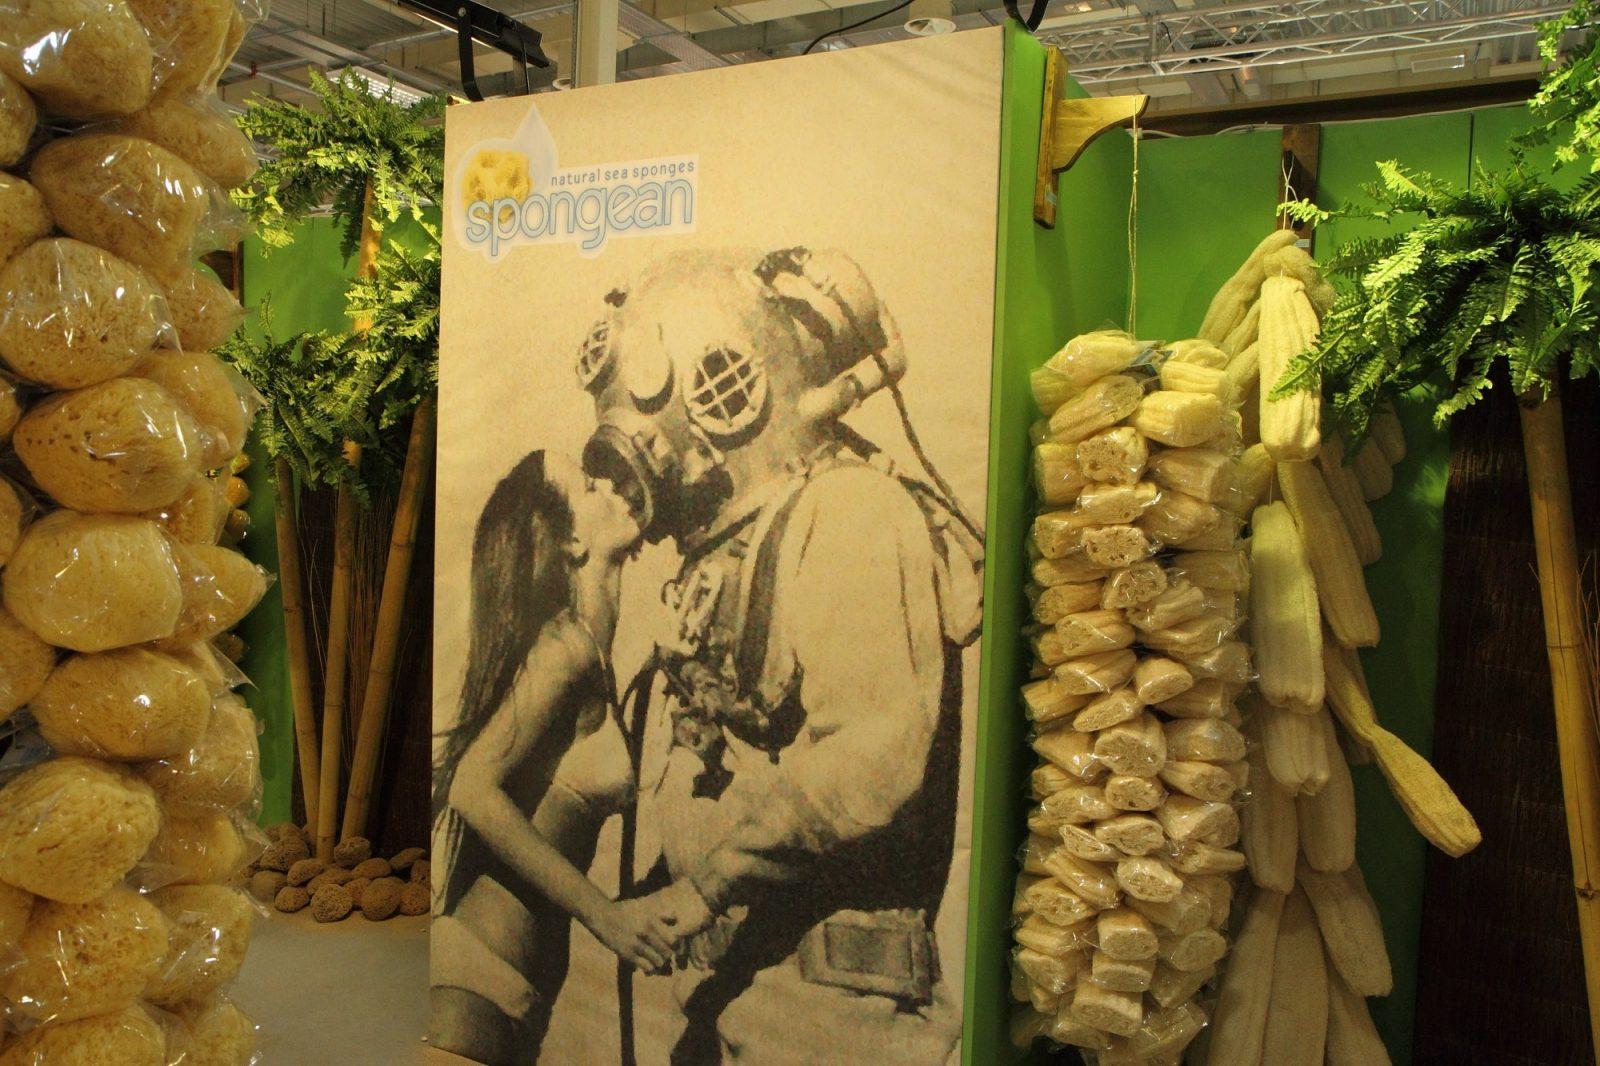 Spongean - A natural sea sponge bulk supplier